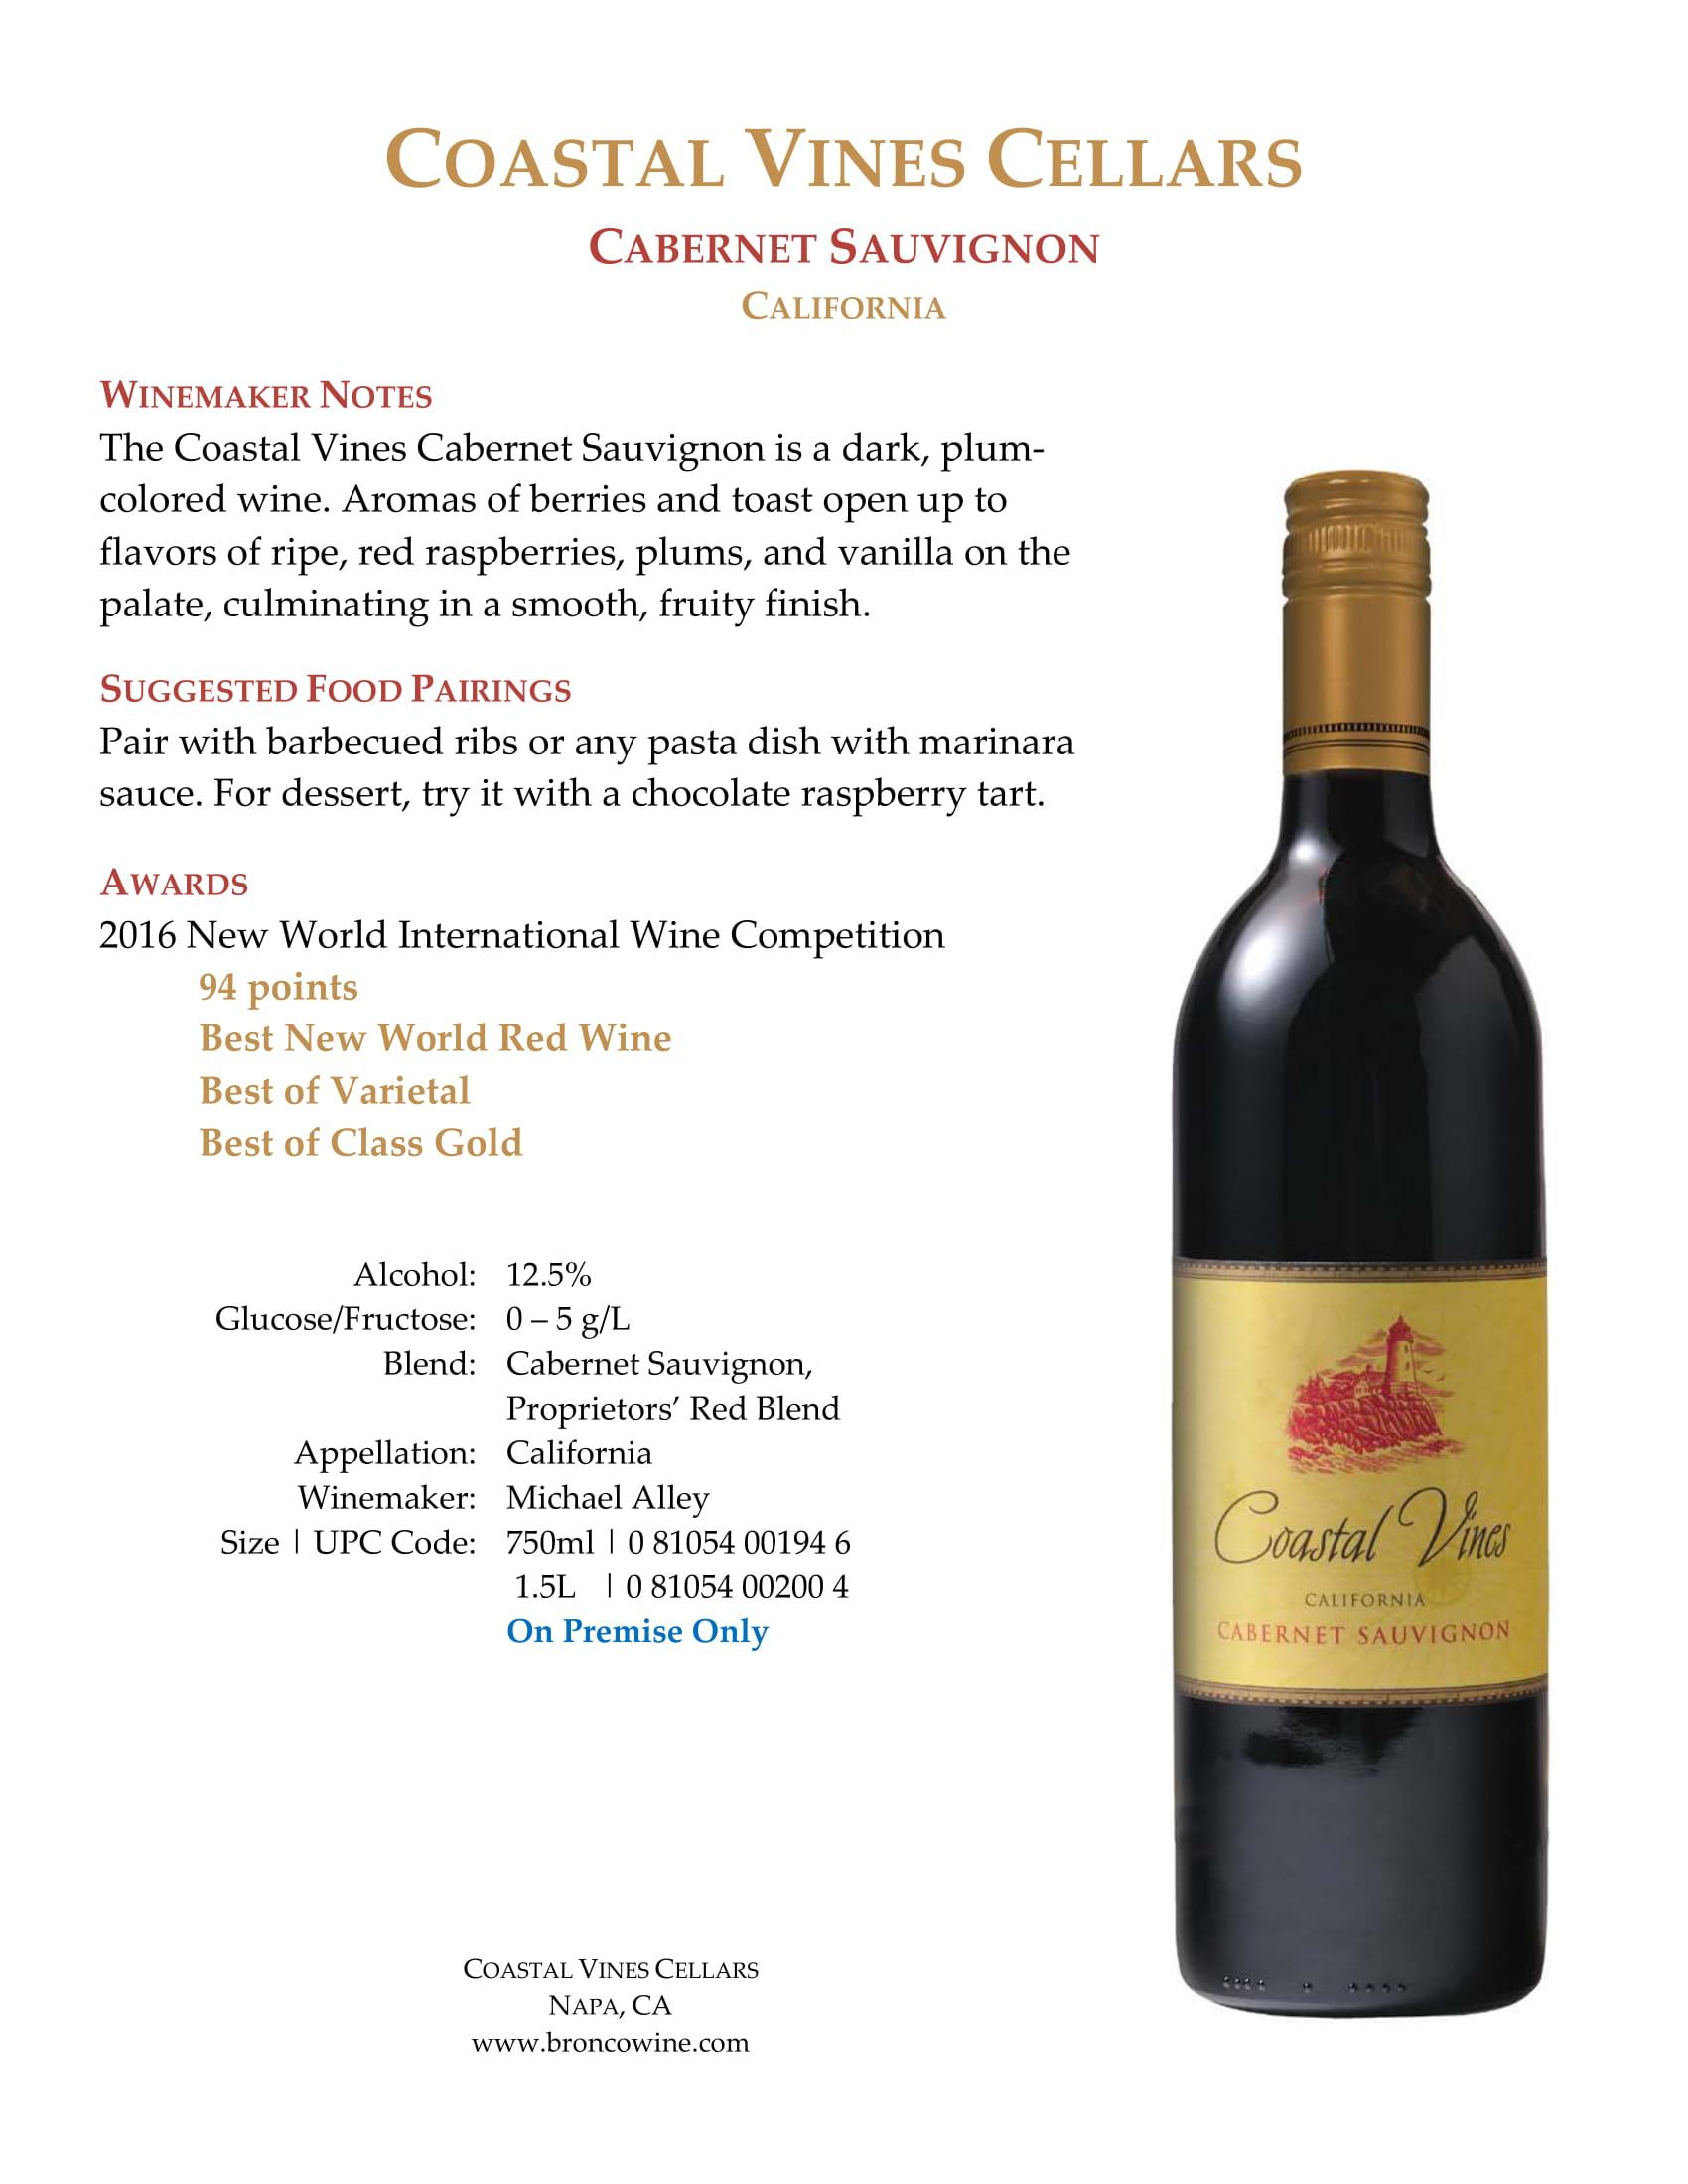 Coastal Vines Cabernet Sauvignon Sell Sheet